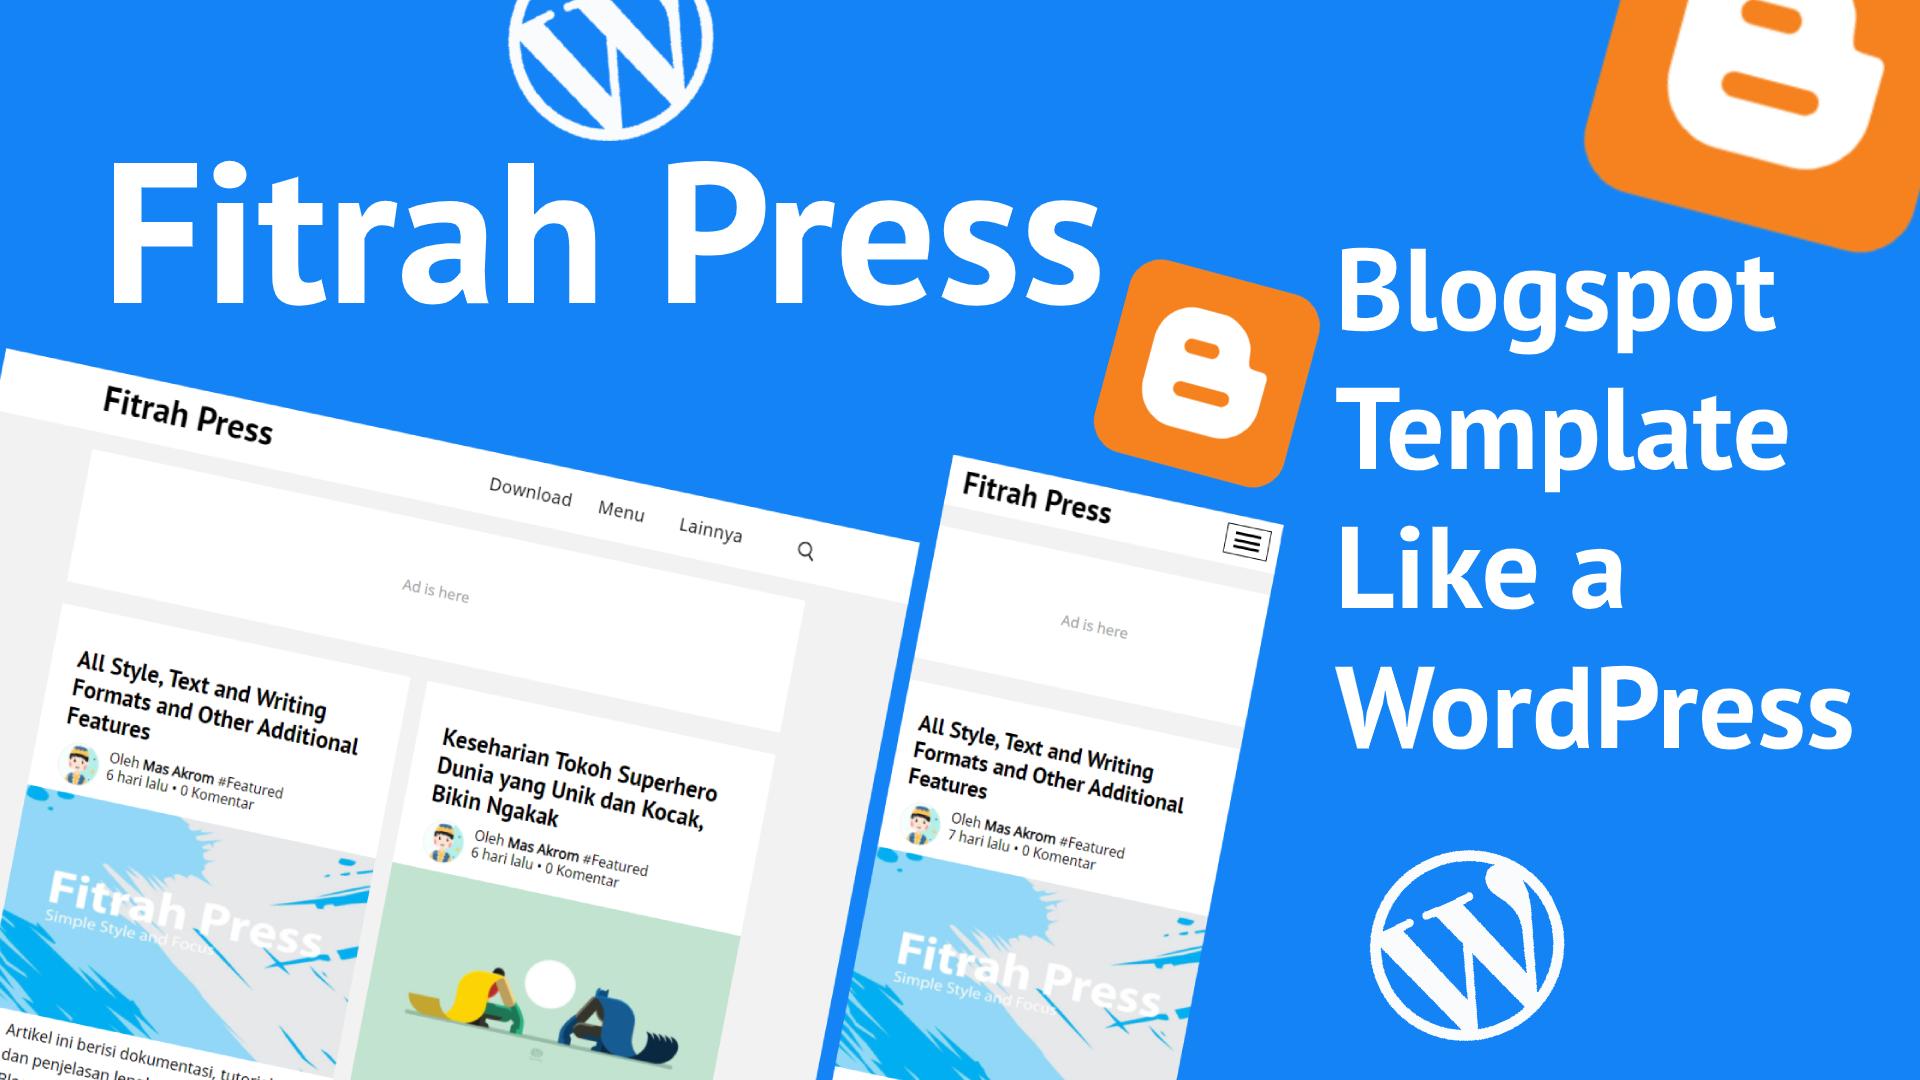 Fitrah Press